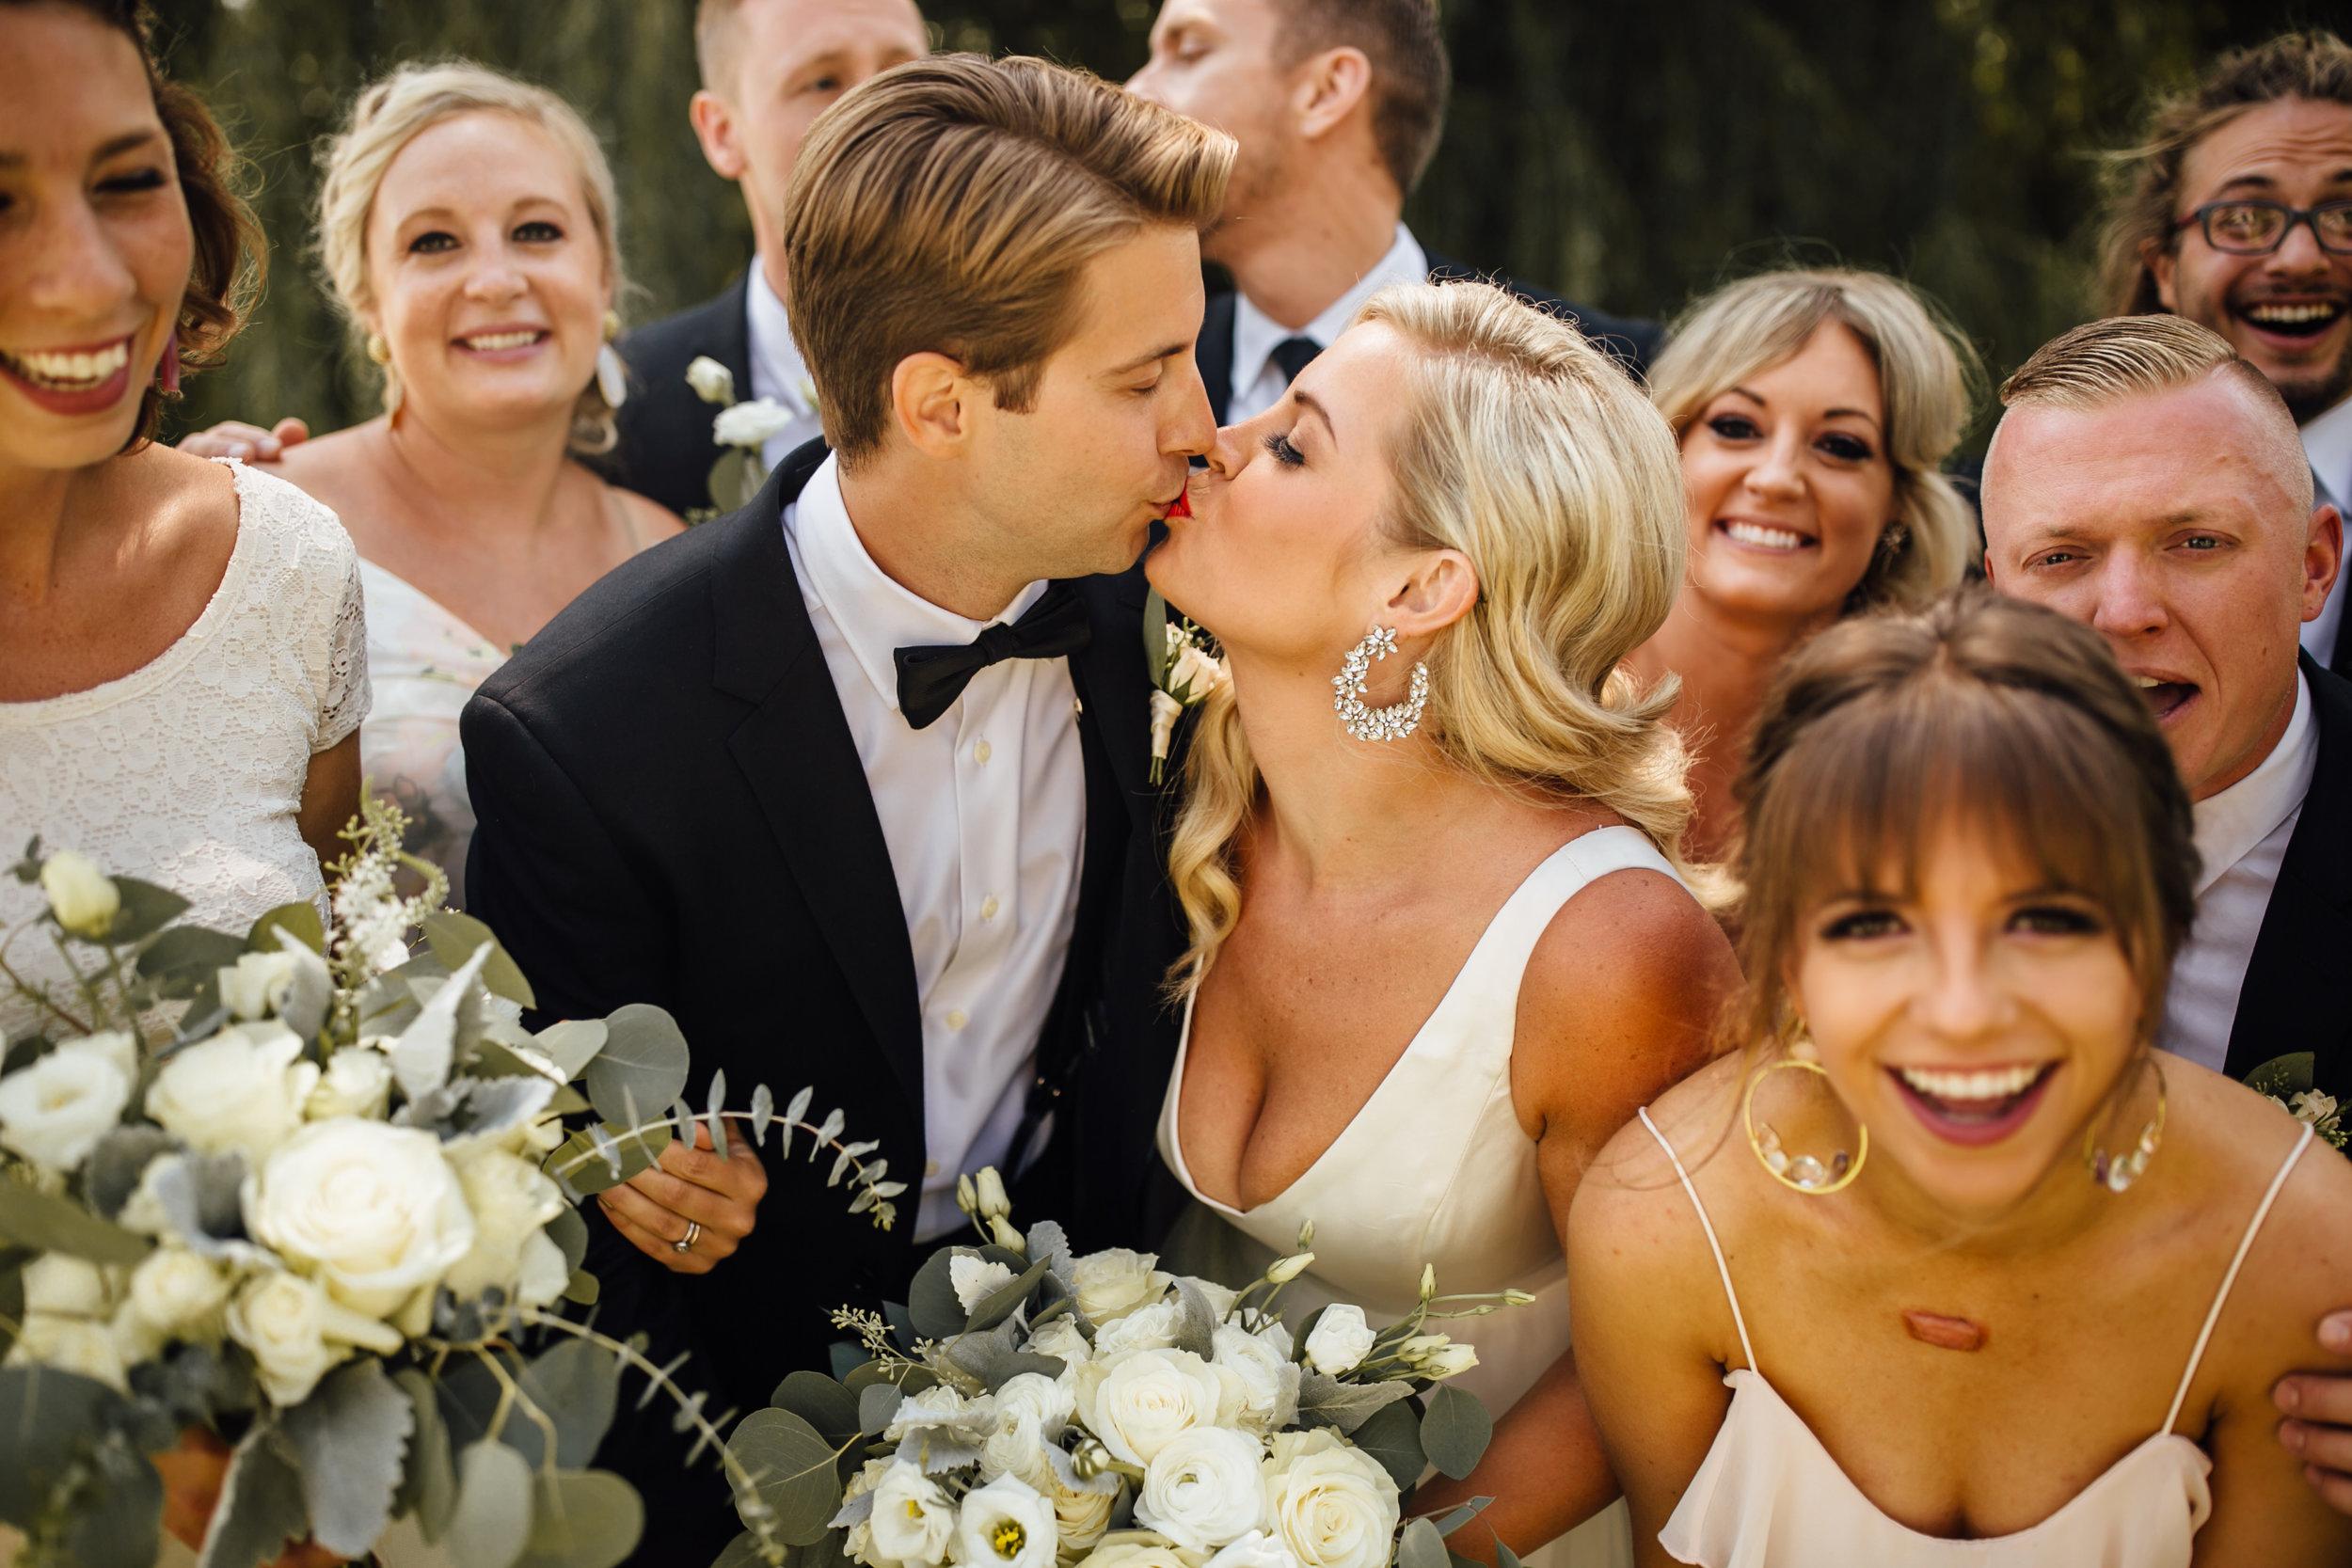 2018-8-Chelsea-Rich-Preview-Traverse-City-Wedding-Michigan-Wedding-Photographer-103.jpg